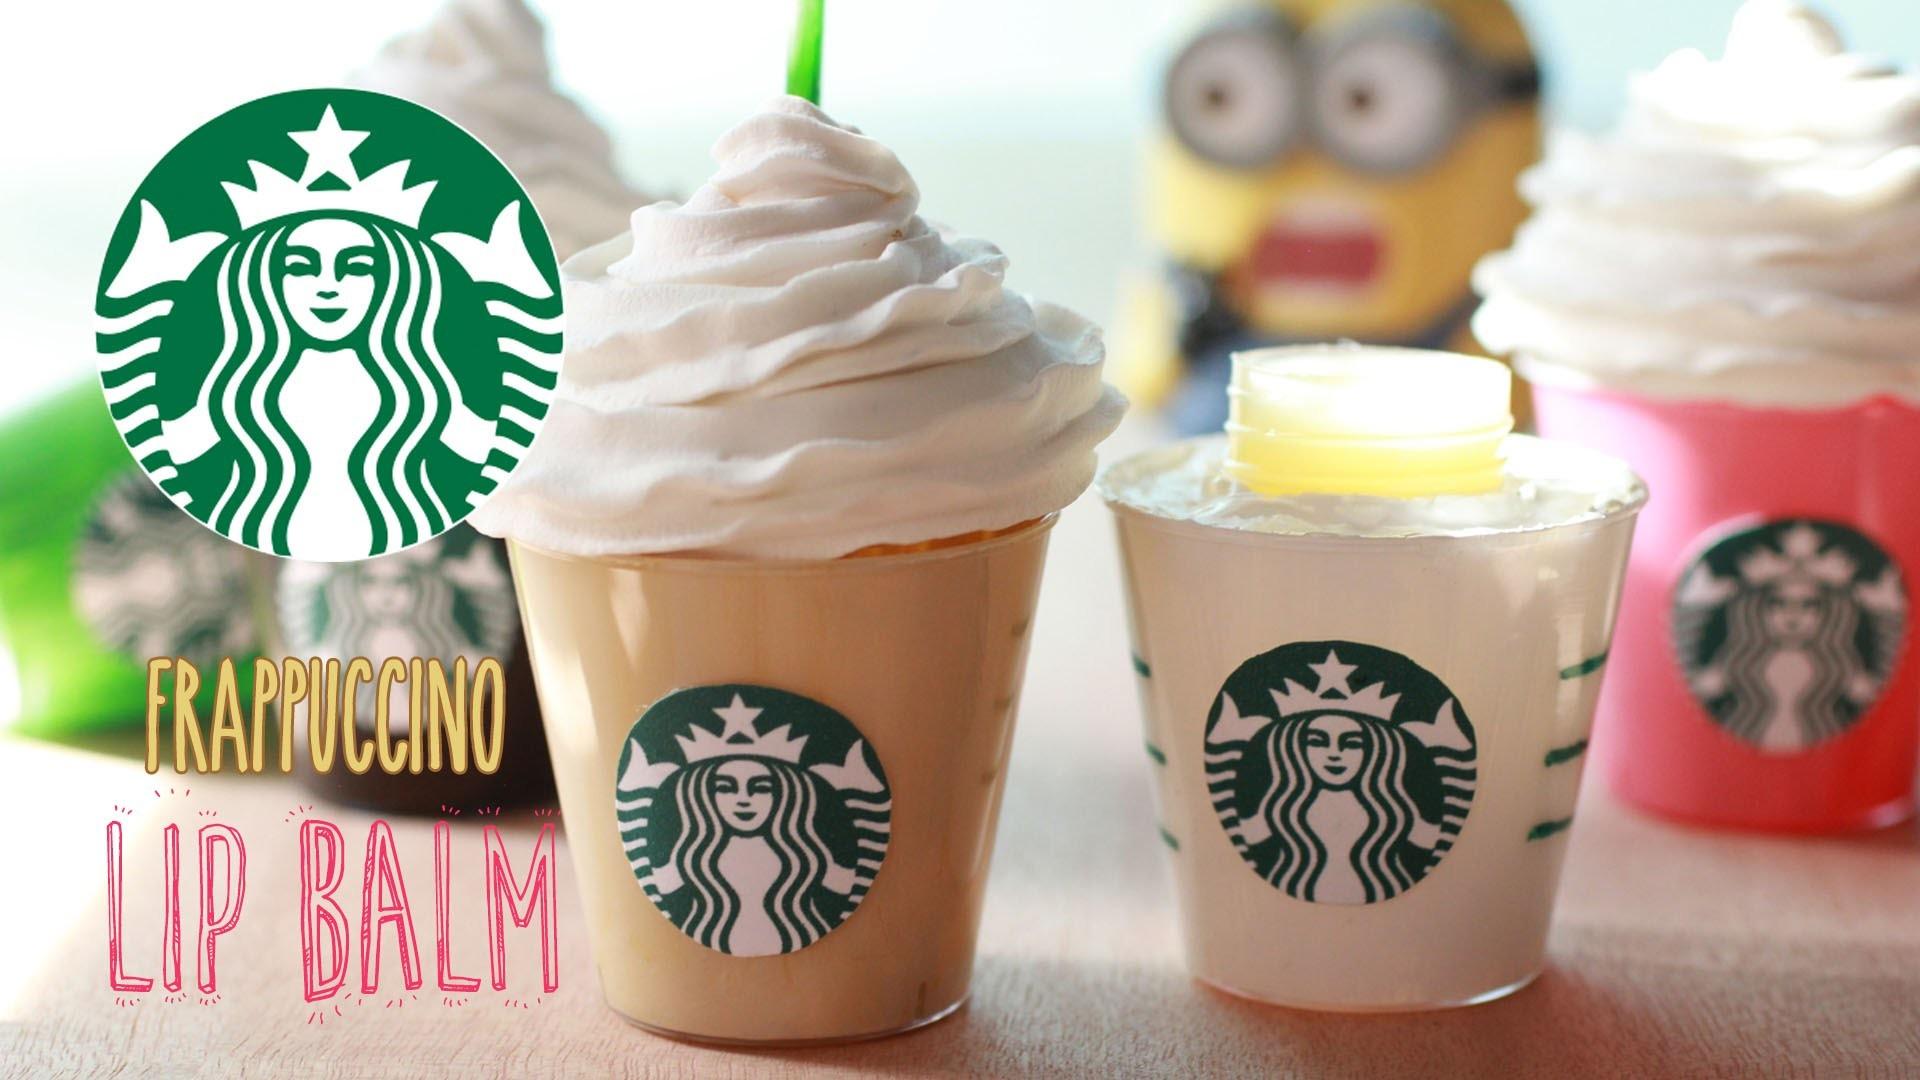 DIY Starbucks Frappuccino Lip Gloss - How To Make Sweet Coffee Lip Balm Recipe - Homemade